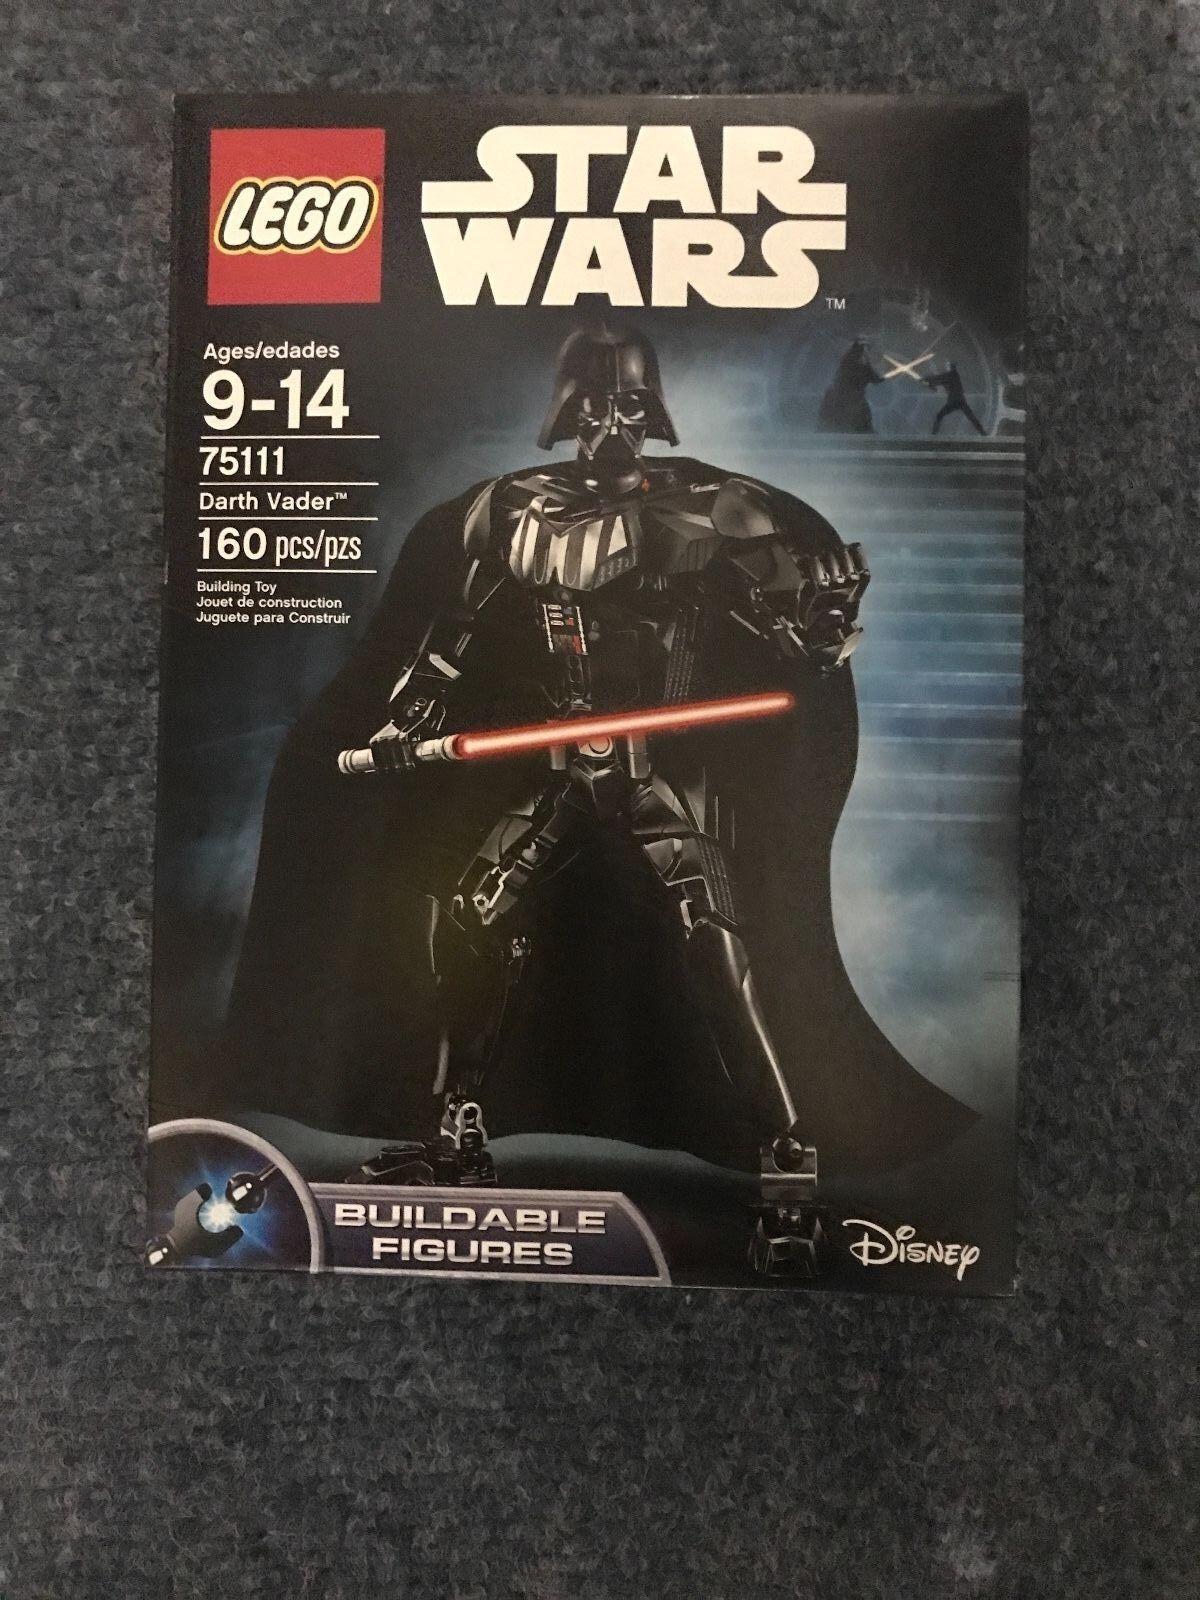 LEGO 75111 Star Wars Darth Vader Buildable Figure